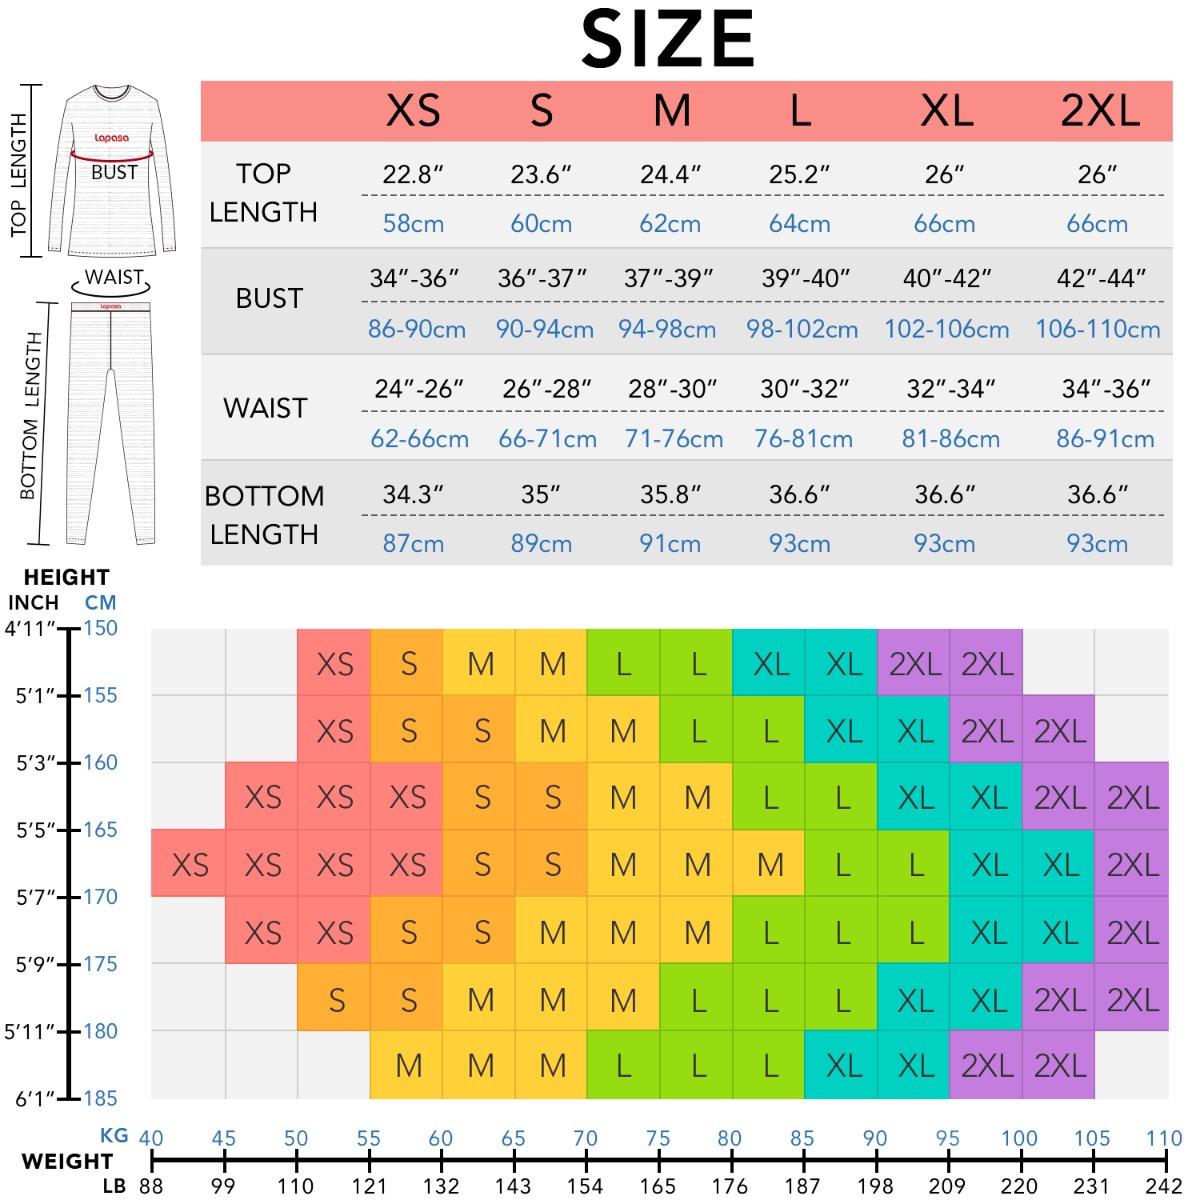 L58 size chart